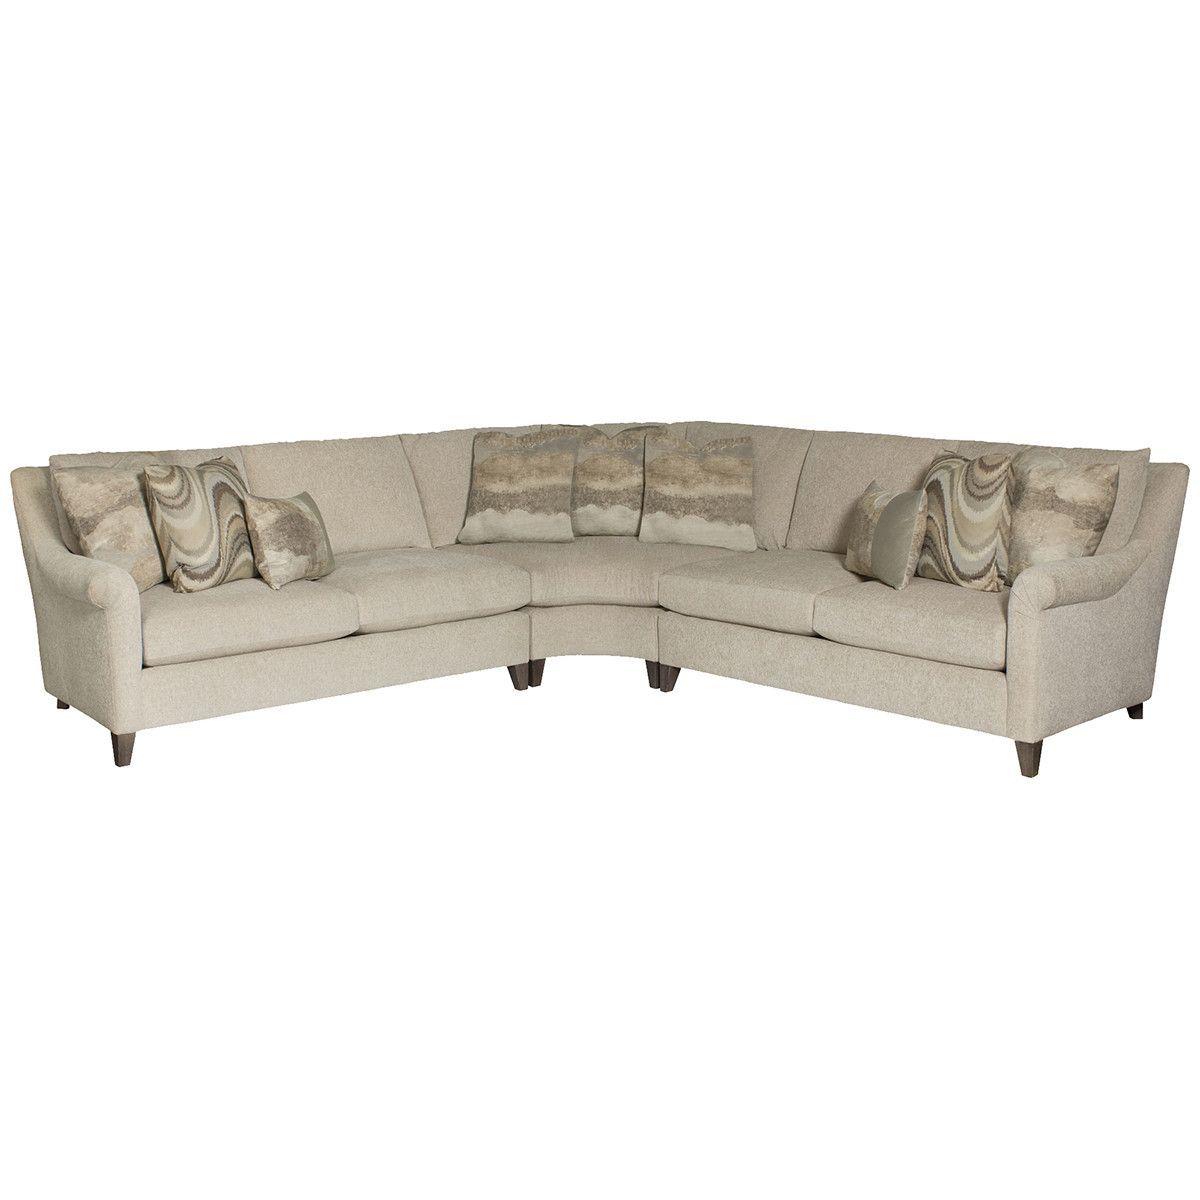 Bernhardt Upholstery Sherman Sectional Sofa Sectional Sofa Couch Furniture Sectional Sofa